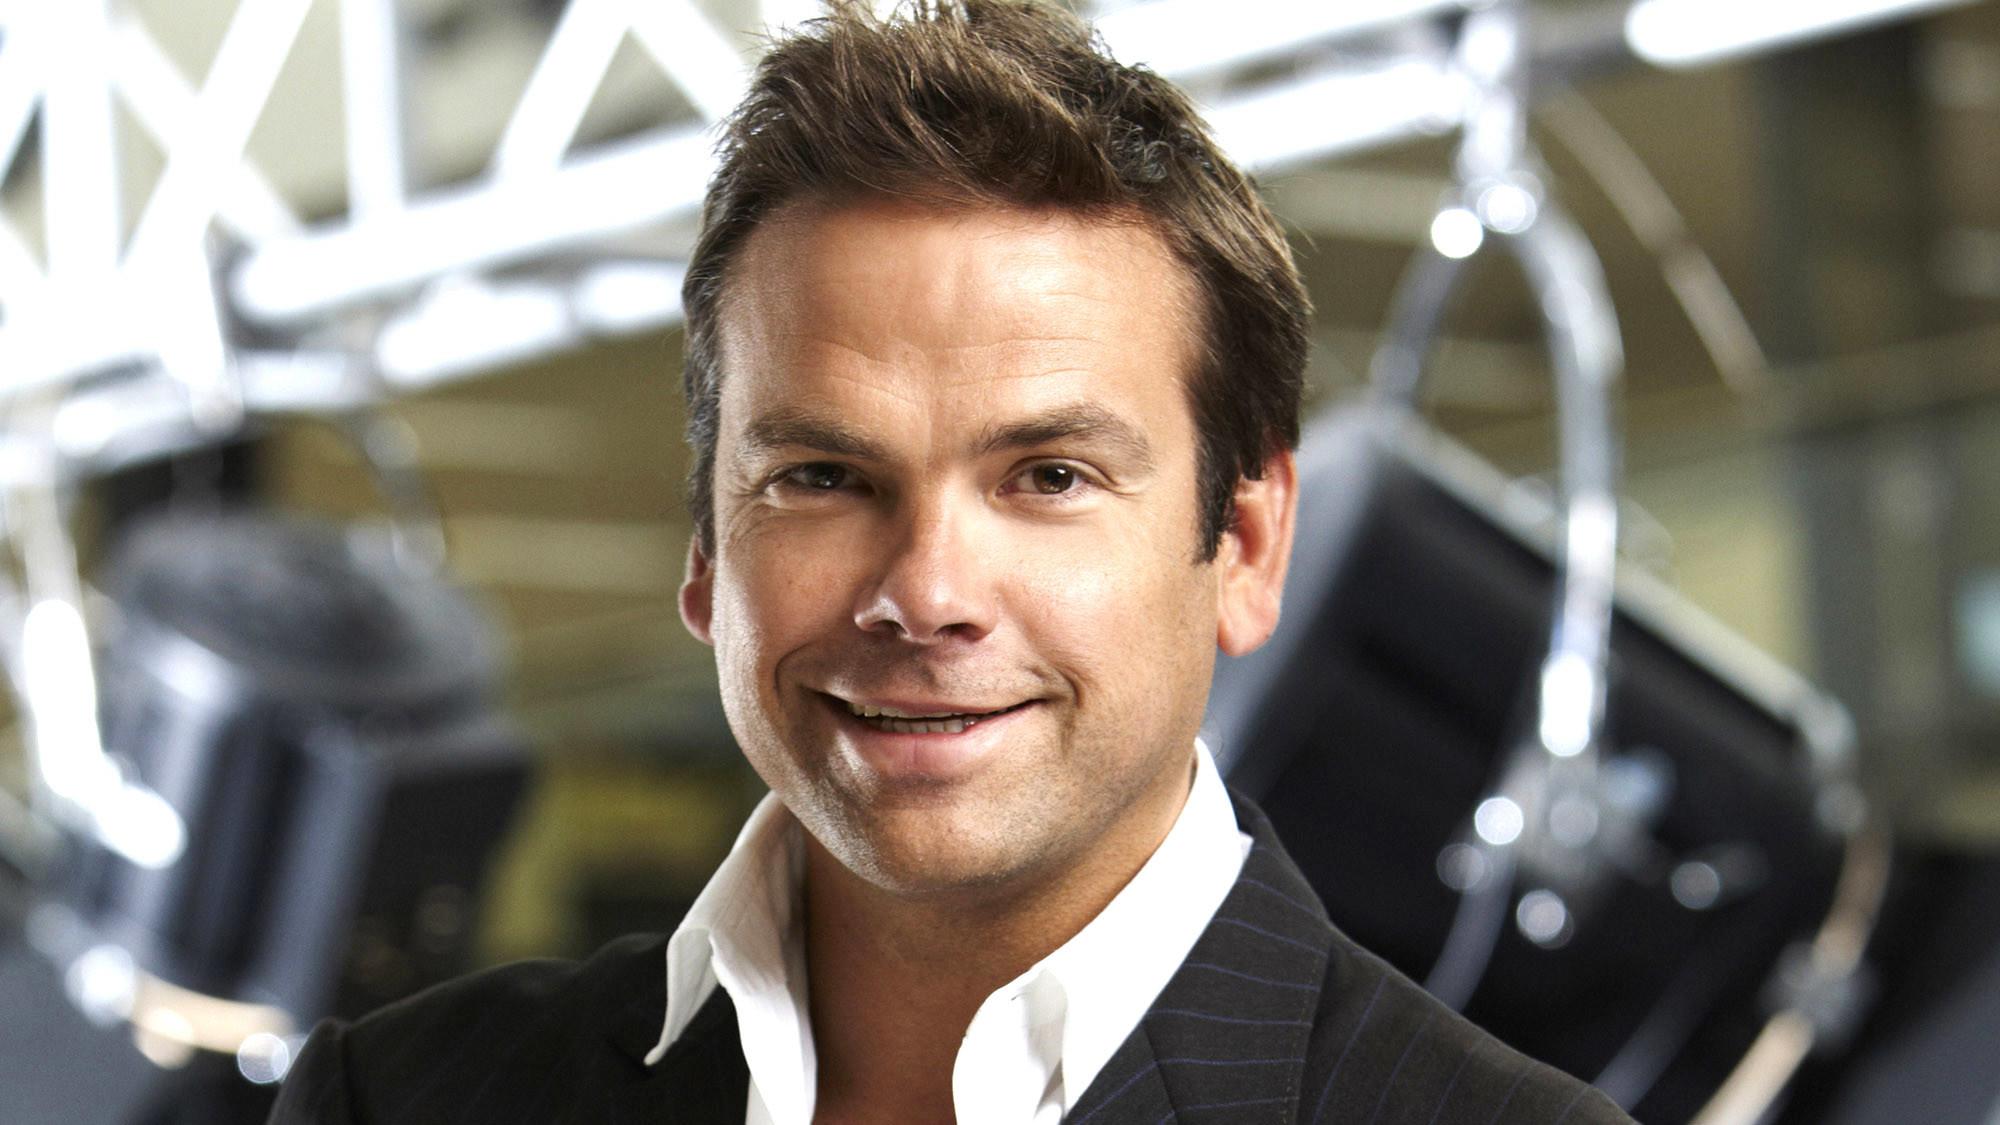 Lachlan Murdoch Executive Chairman of 21st Century Fox